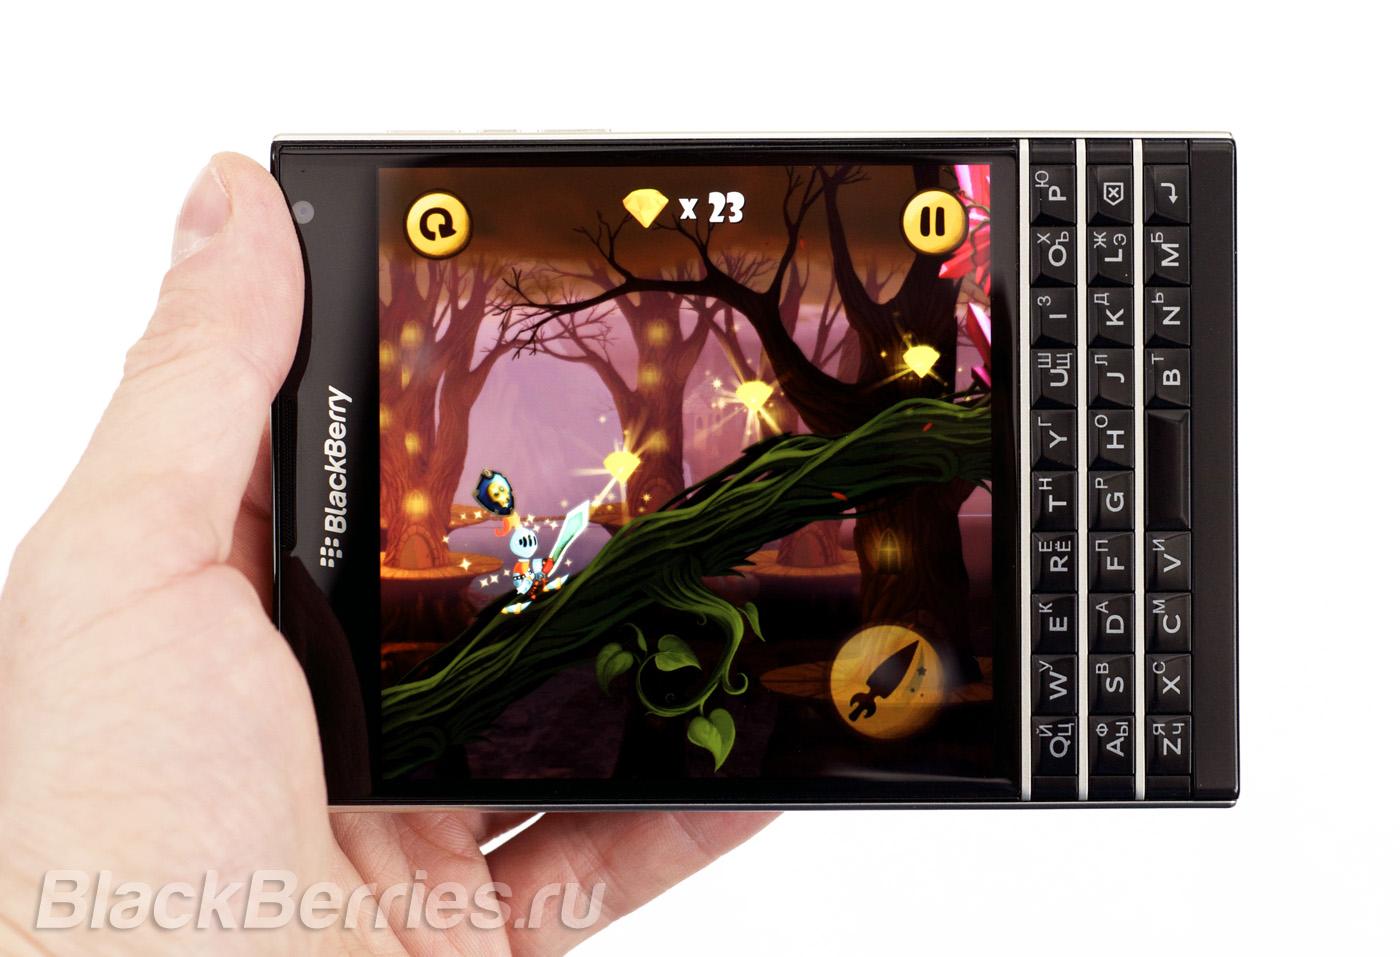 BlackBerry Passport Troubles Land image photo 1400x957